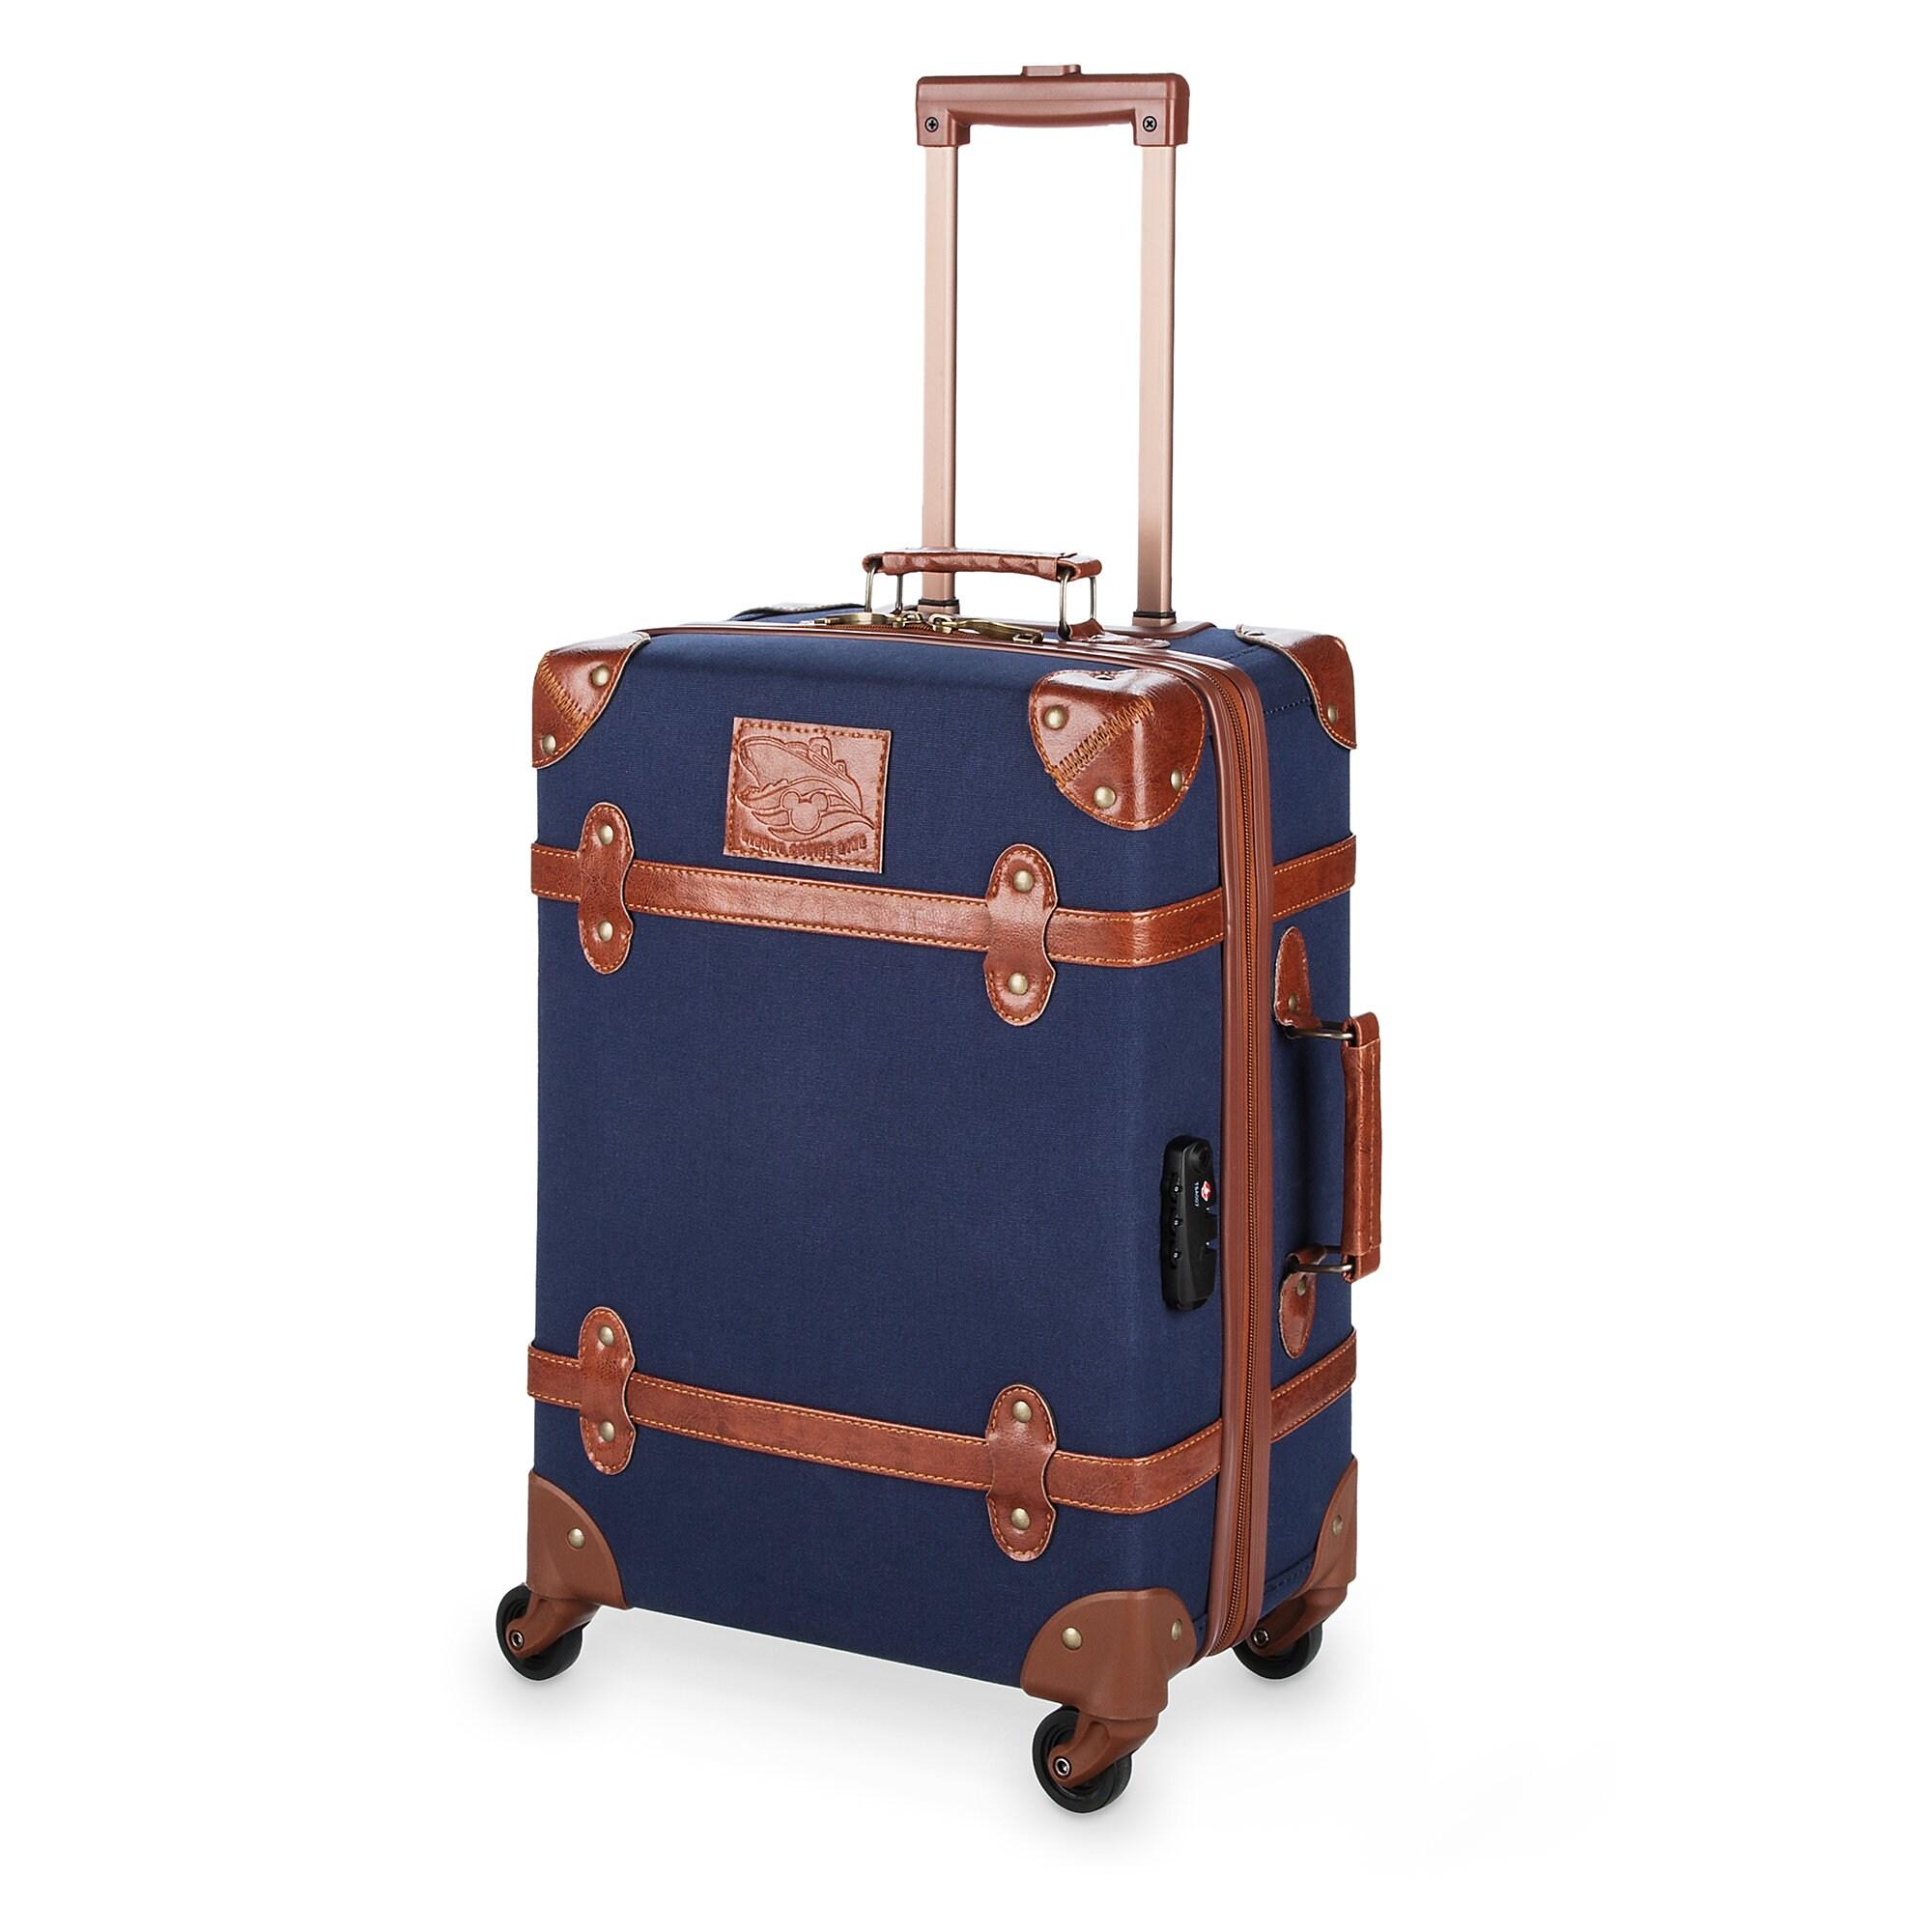 Disney Cruise Line Rolling Luggage - 21''